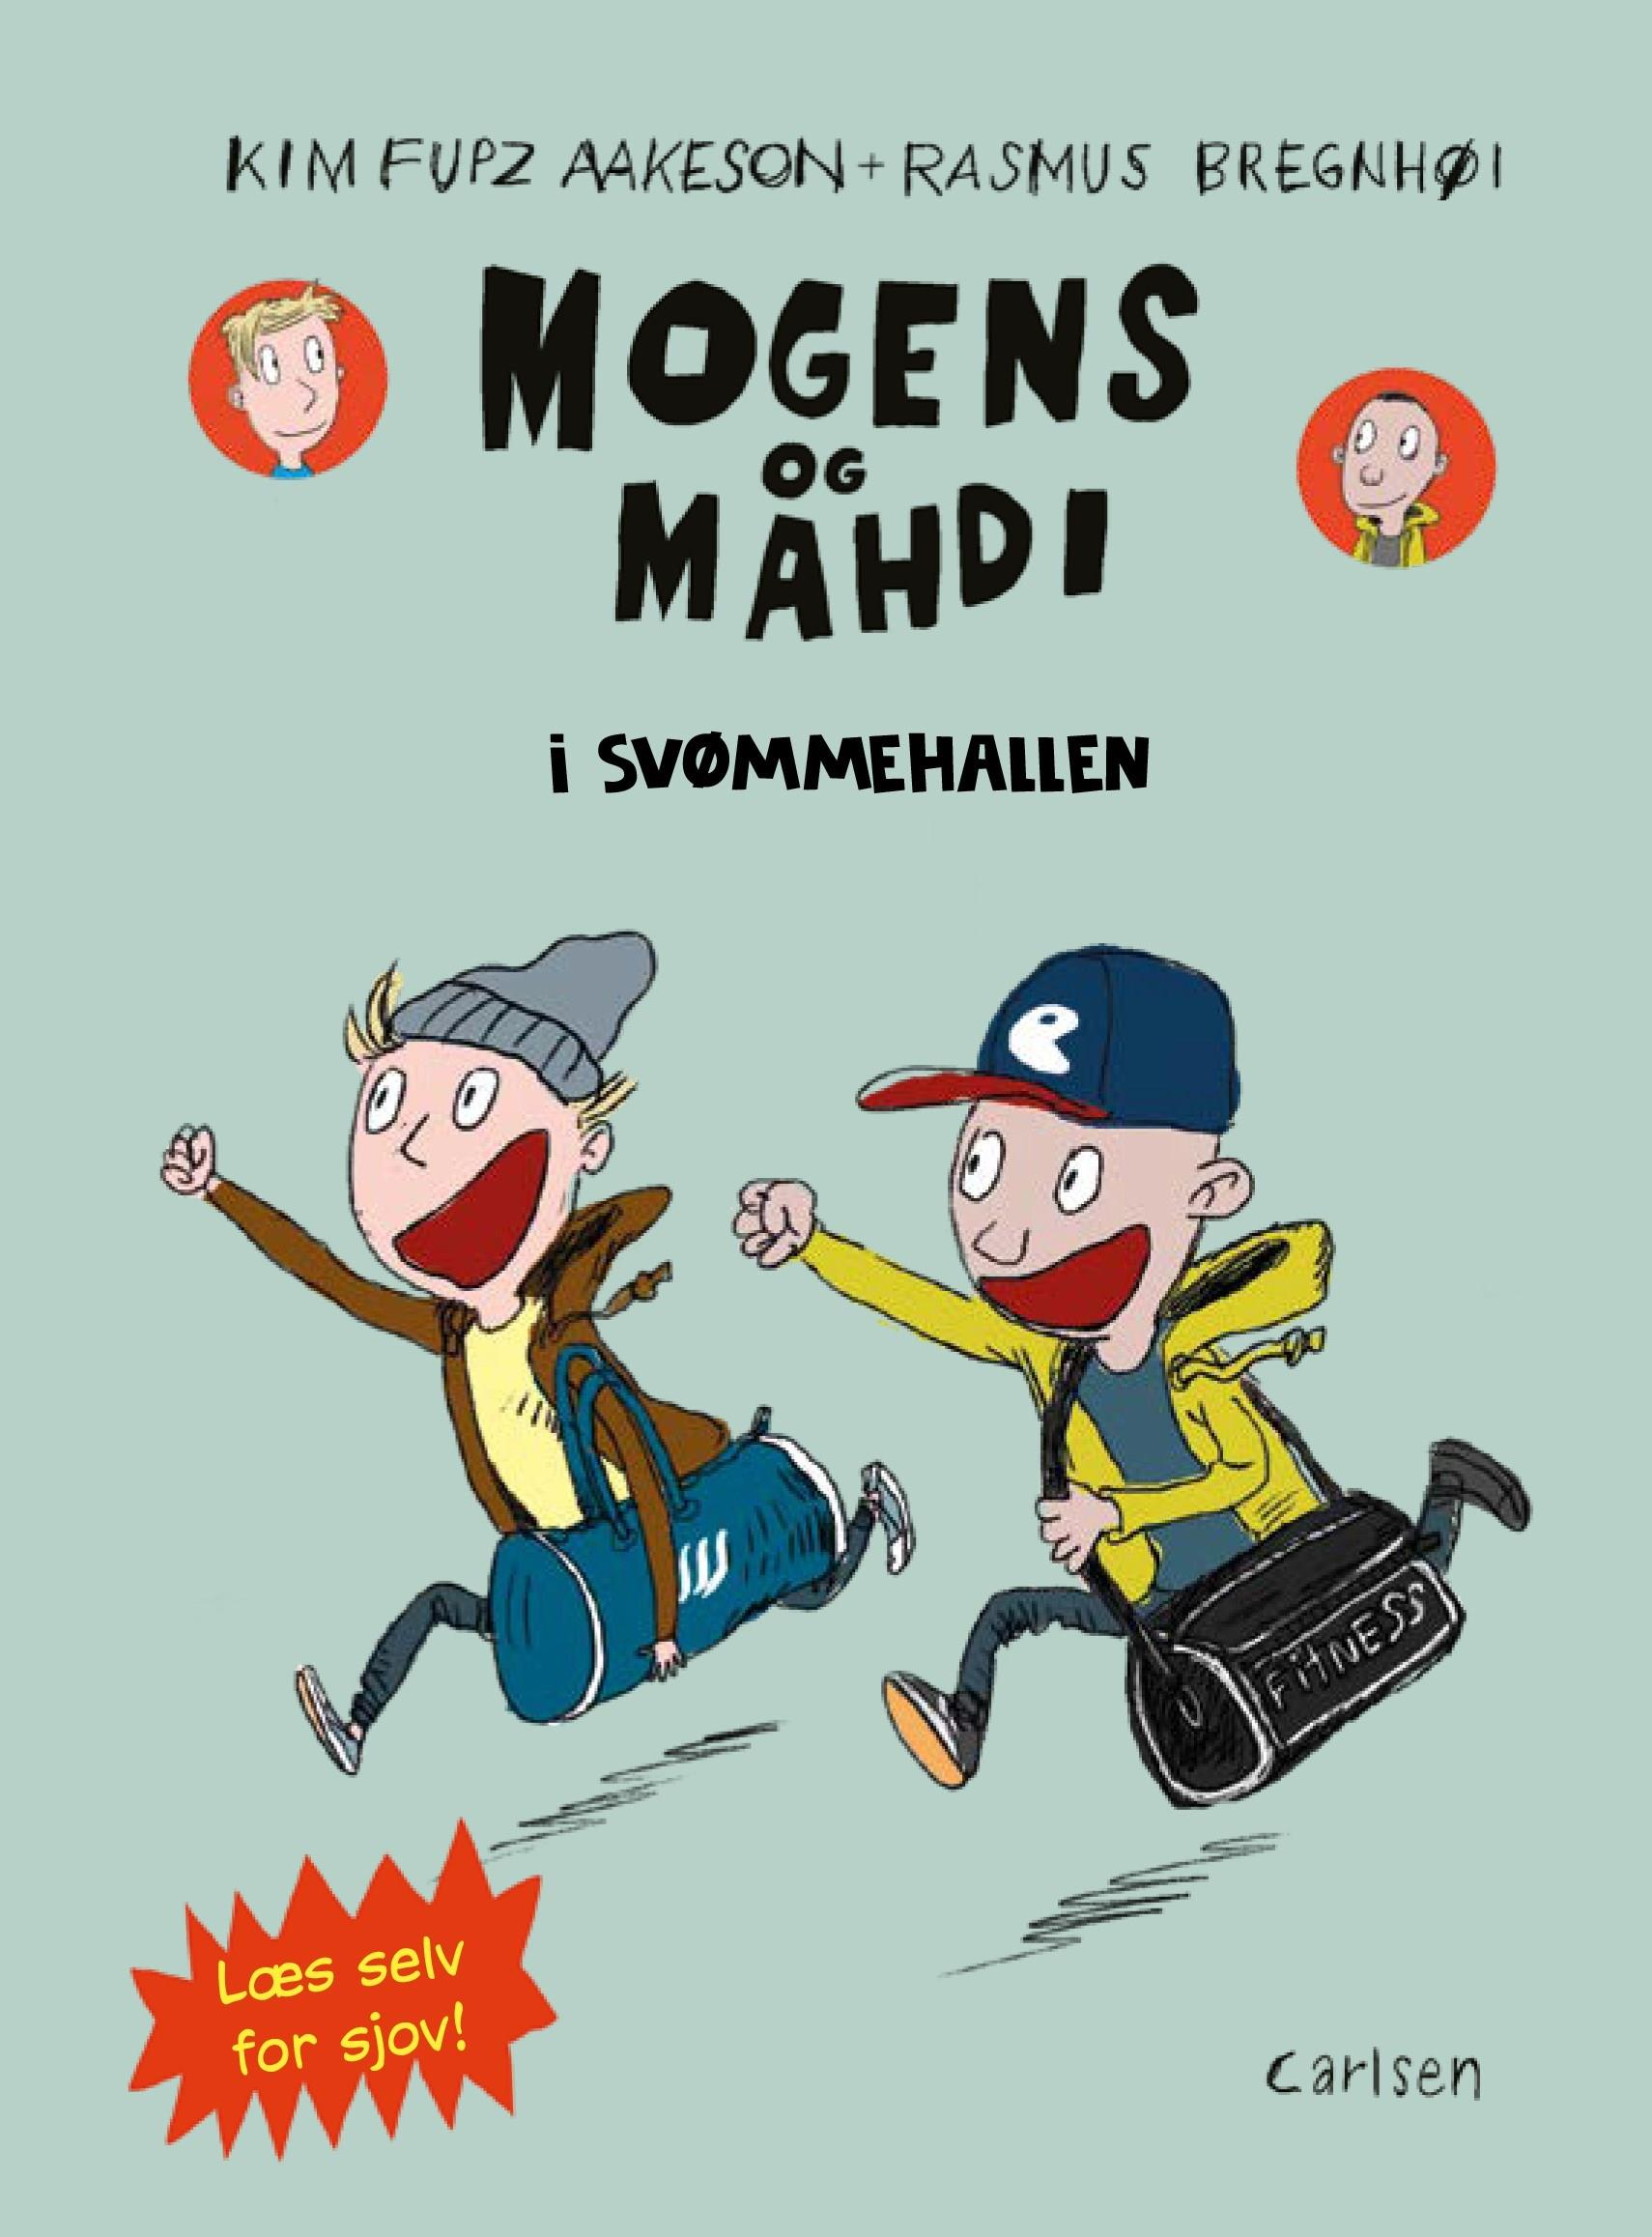 Mogens og Mahdi - Læs selv for sjov: Mogens og Mahdi i svømmehallen - Kim Fupz Aakeson - Bøger - CARLSEN - 9788711912232 - April 11, 2019